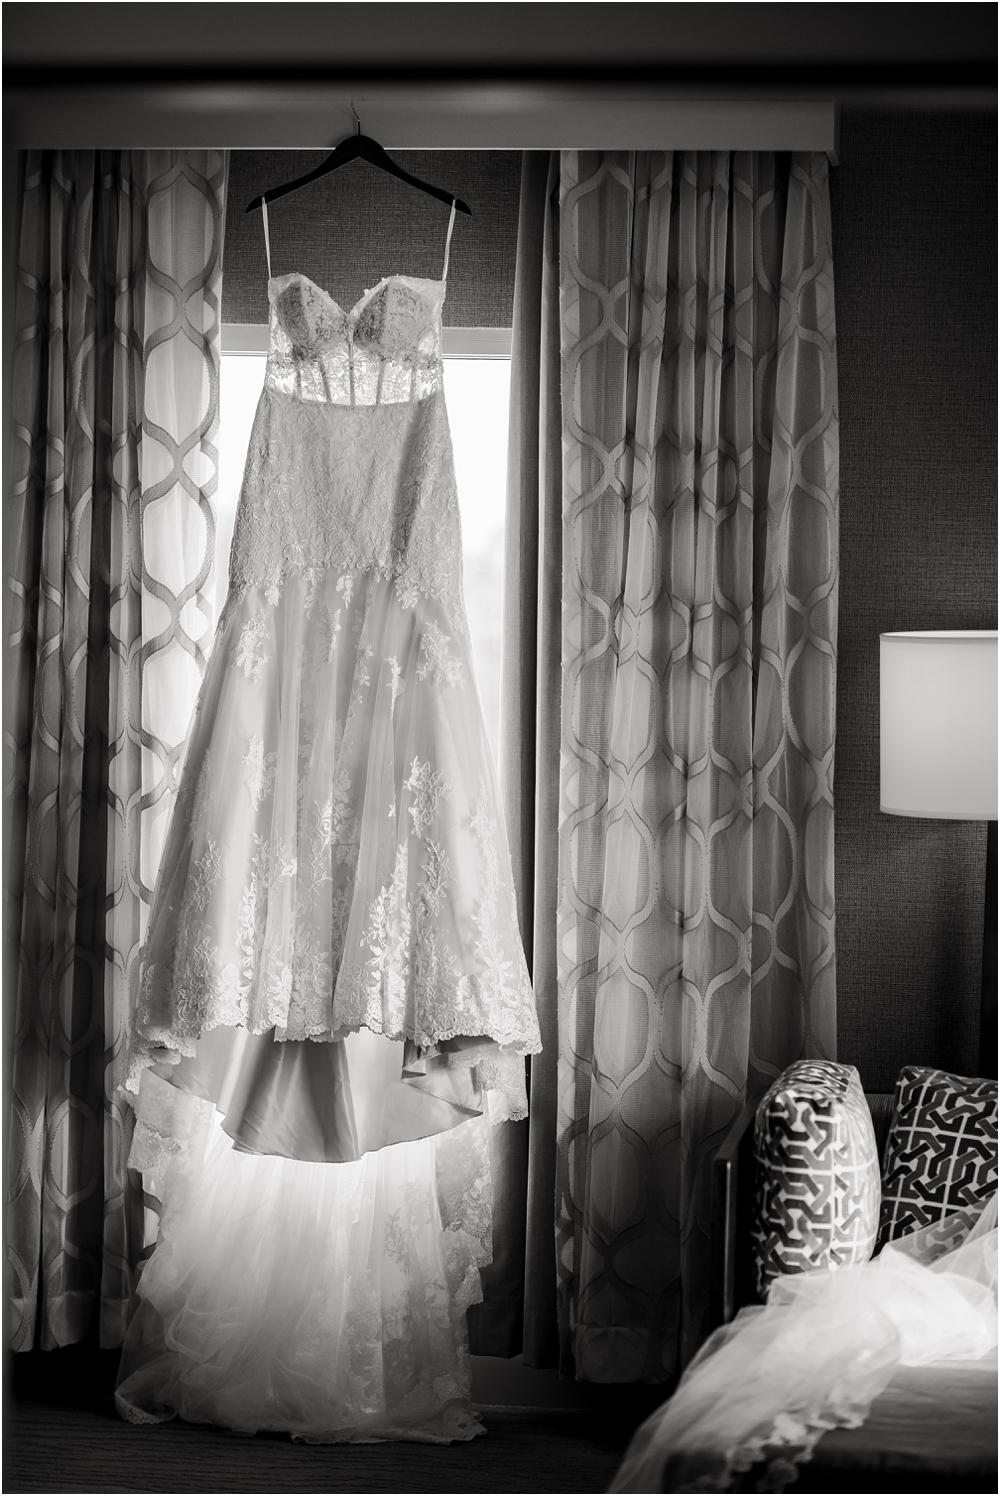 imhof-sheraton-panama-city-beach-florida-wedding-photographer-kiersten-grant-5.jpg